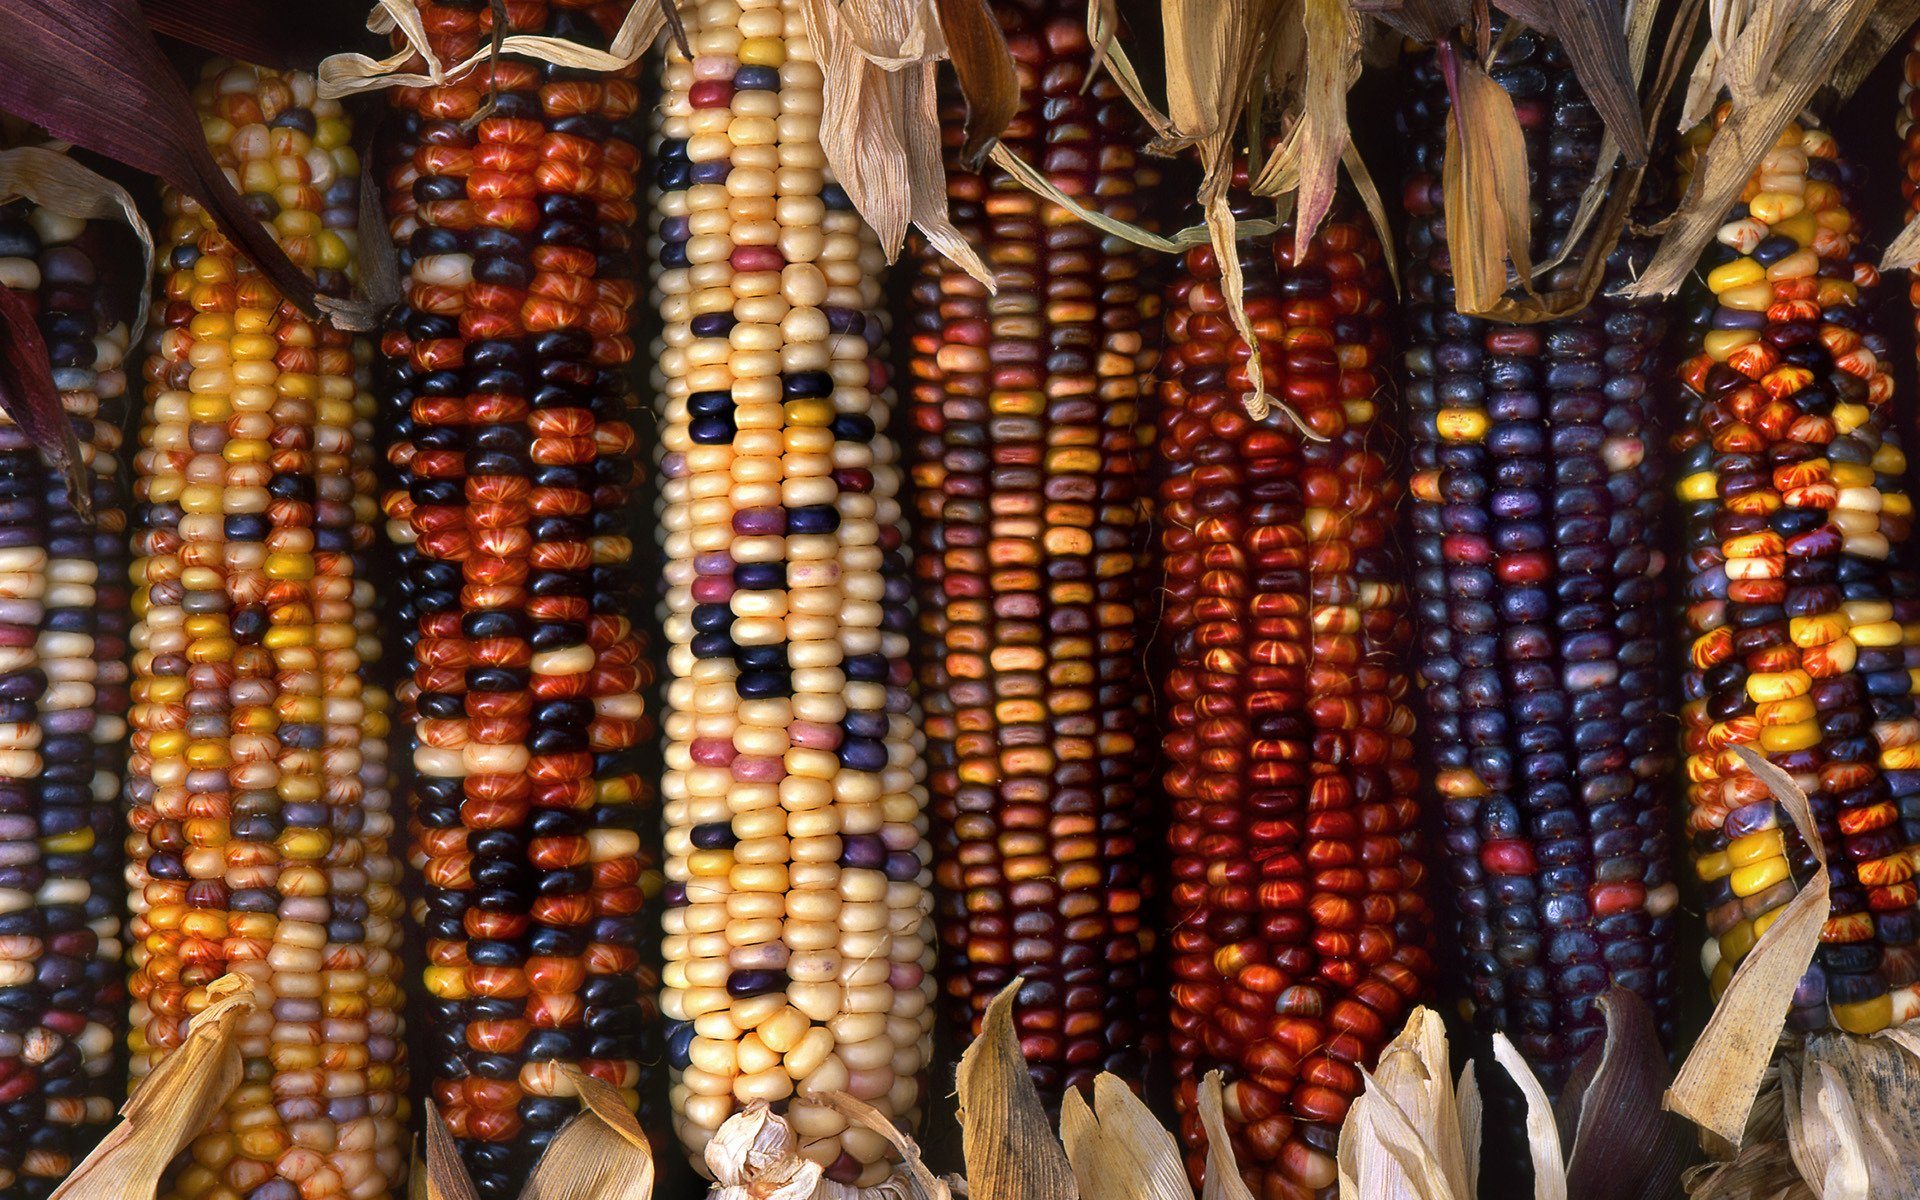 Colorful Food Wallpaper Free Download: Multi-colored Ornamental Indian Corn Full HD Wallpaper And